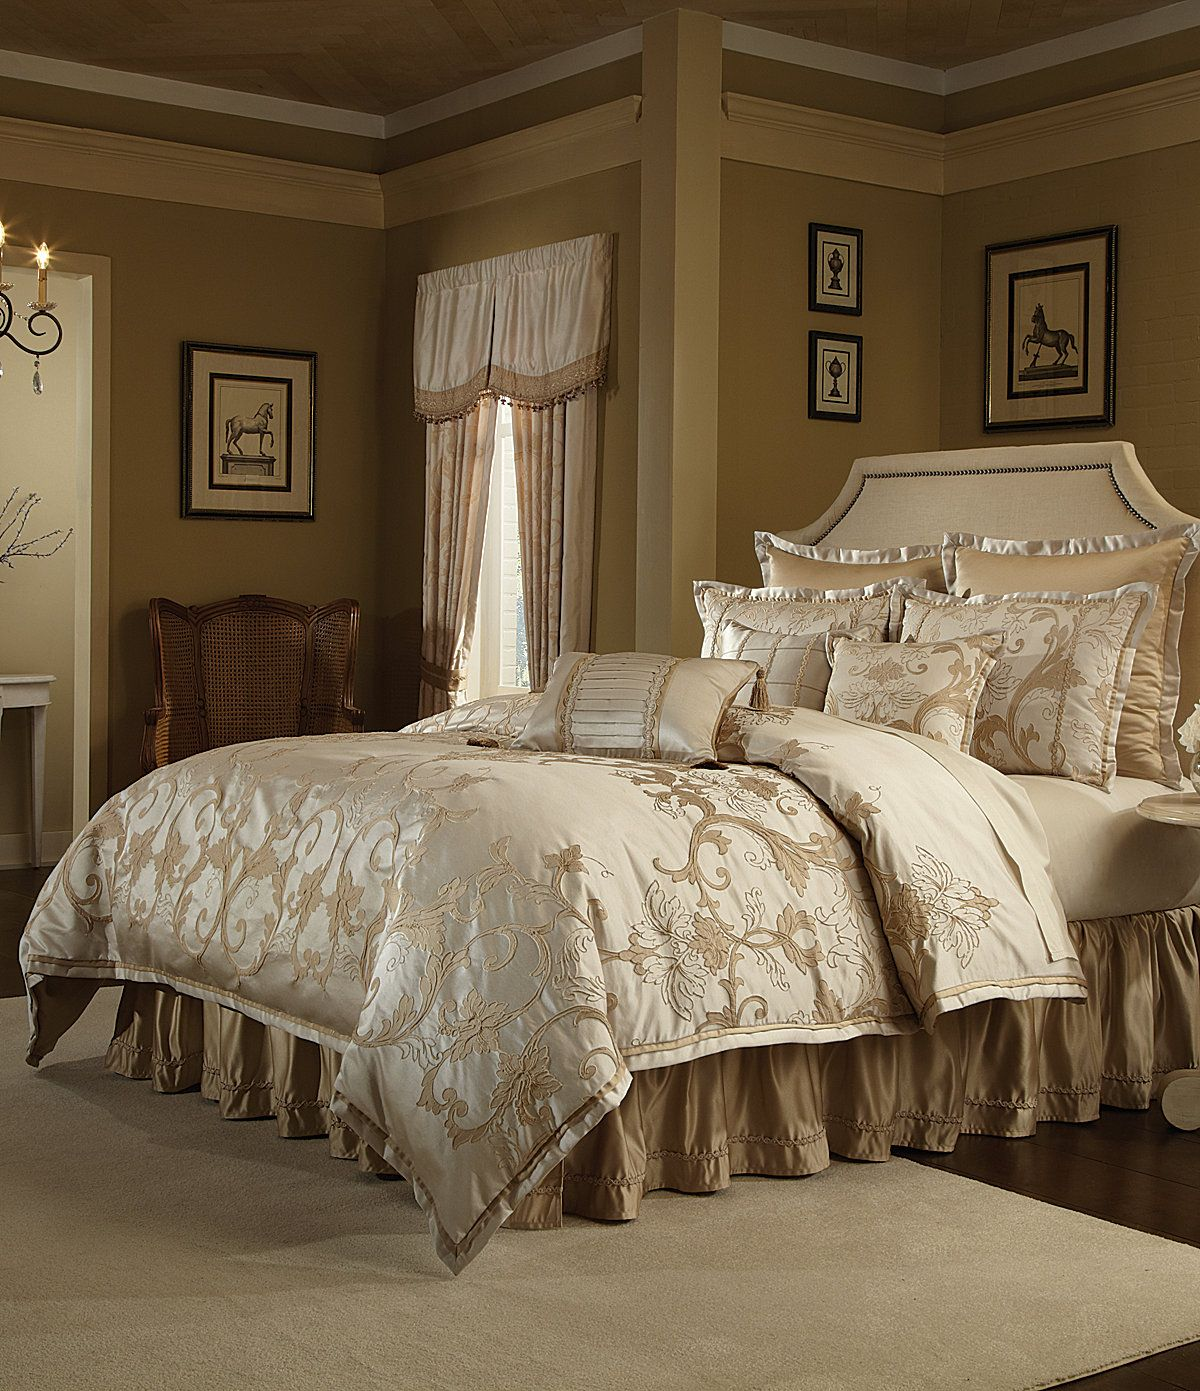 Veratex Verandah Bedding Collection Dillards Com Comforter Sets Bed Decor Home